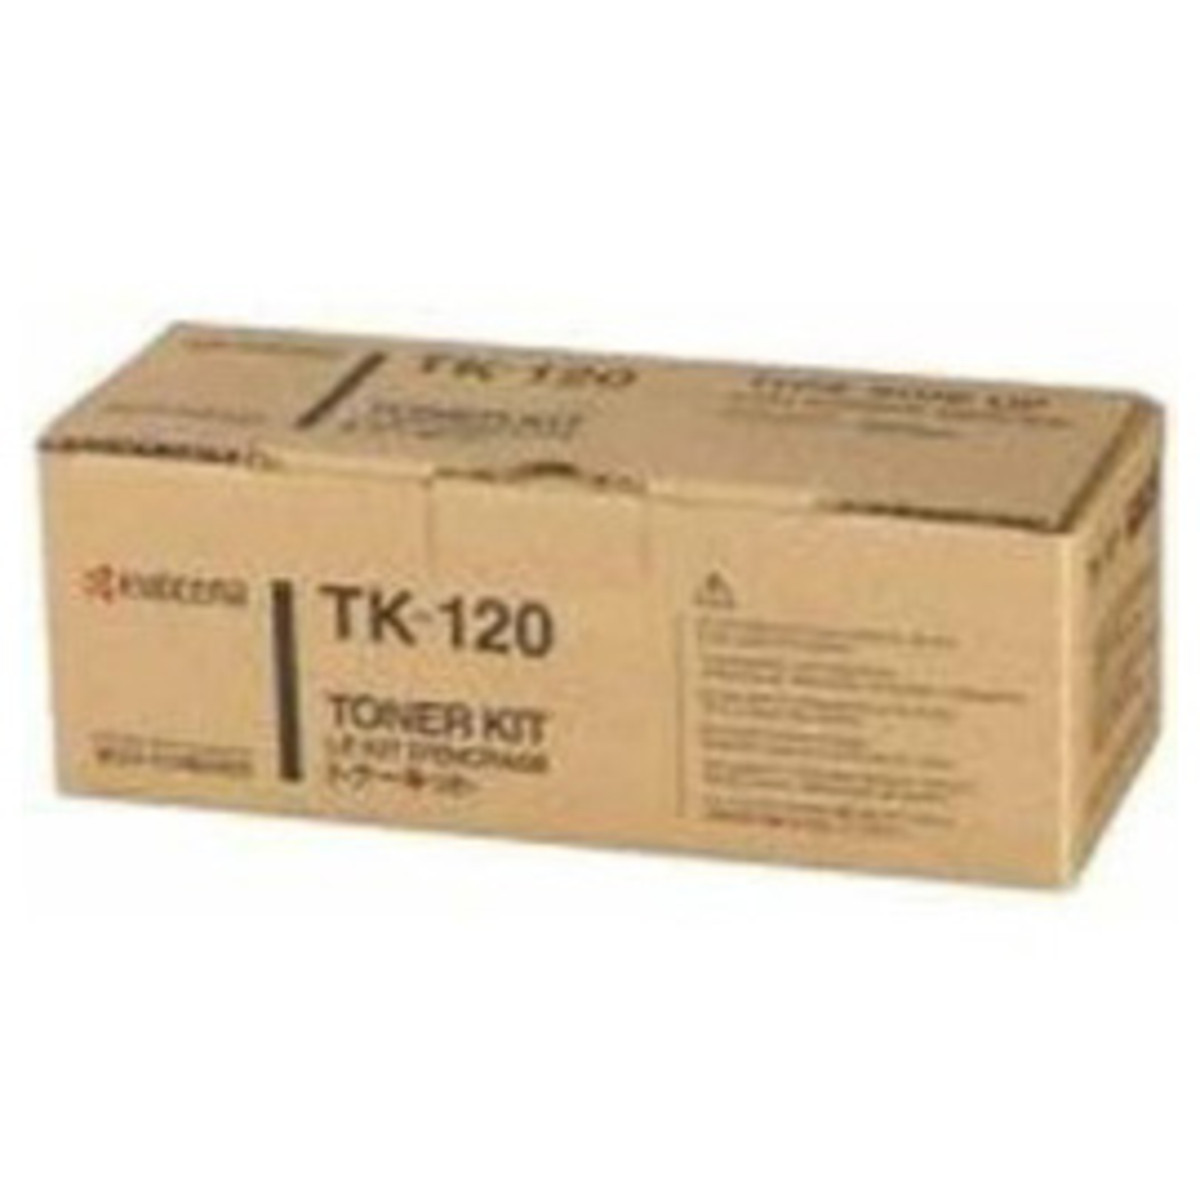 Kyocera TK-120 Black Toner Cartridge